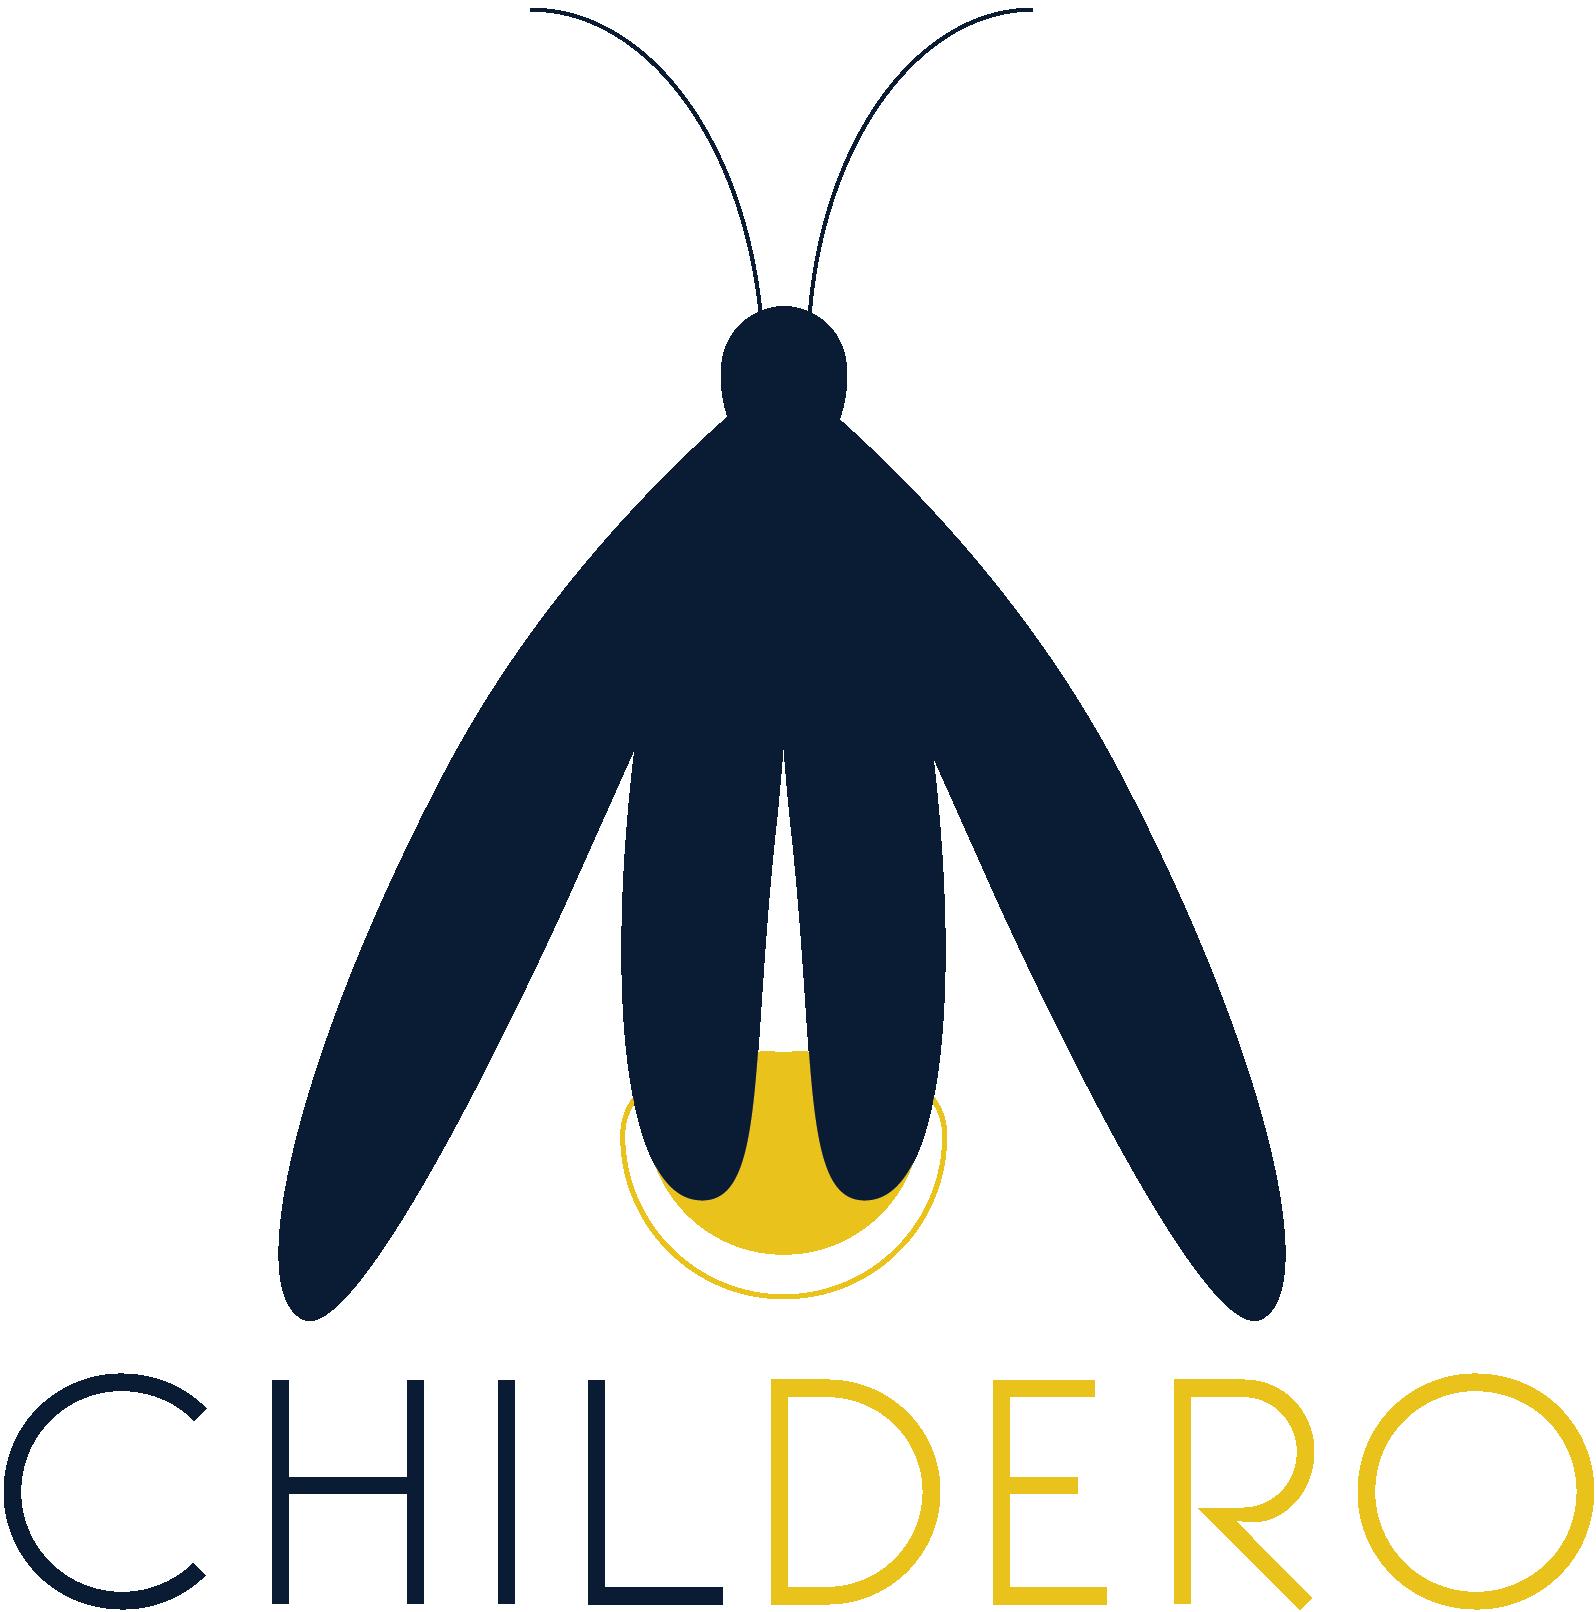 Childero_Artboard 4.png